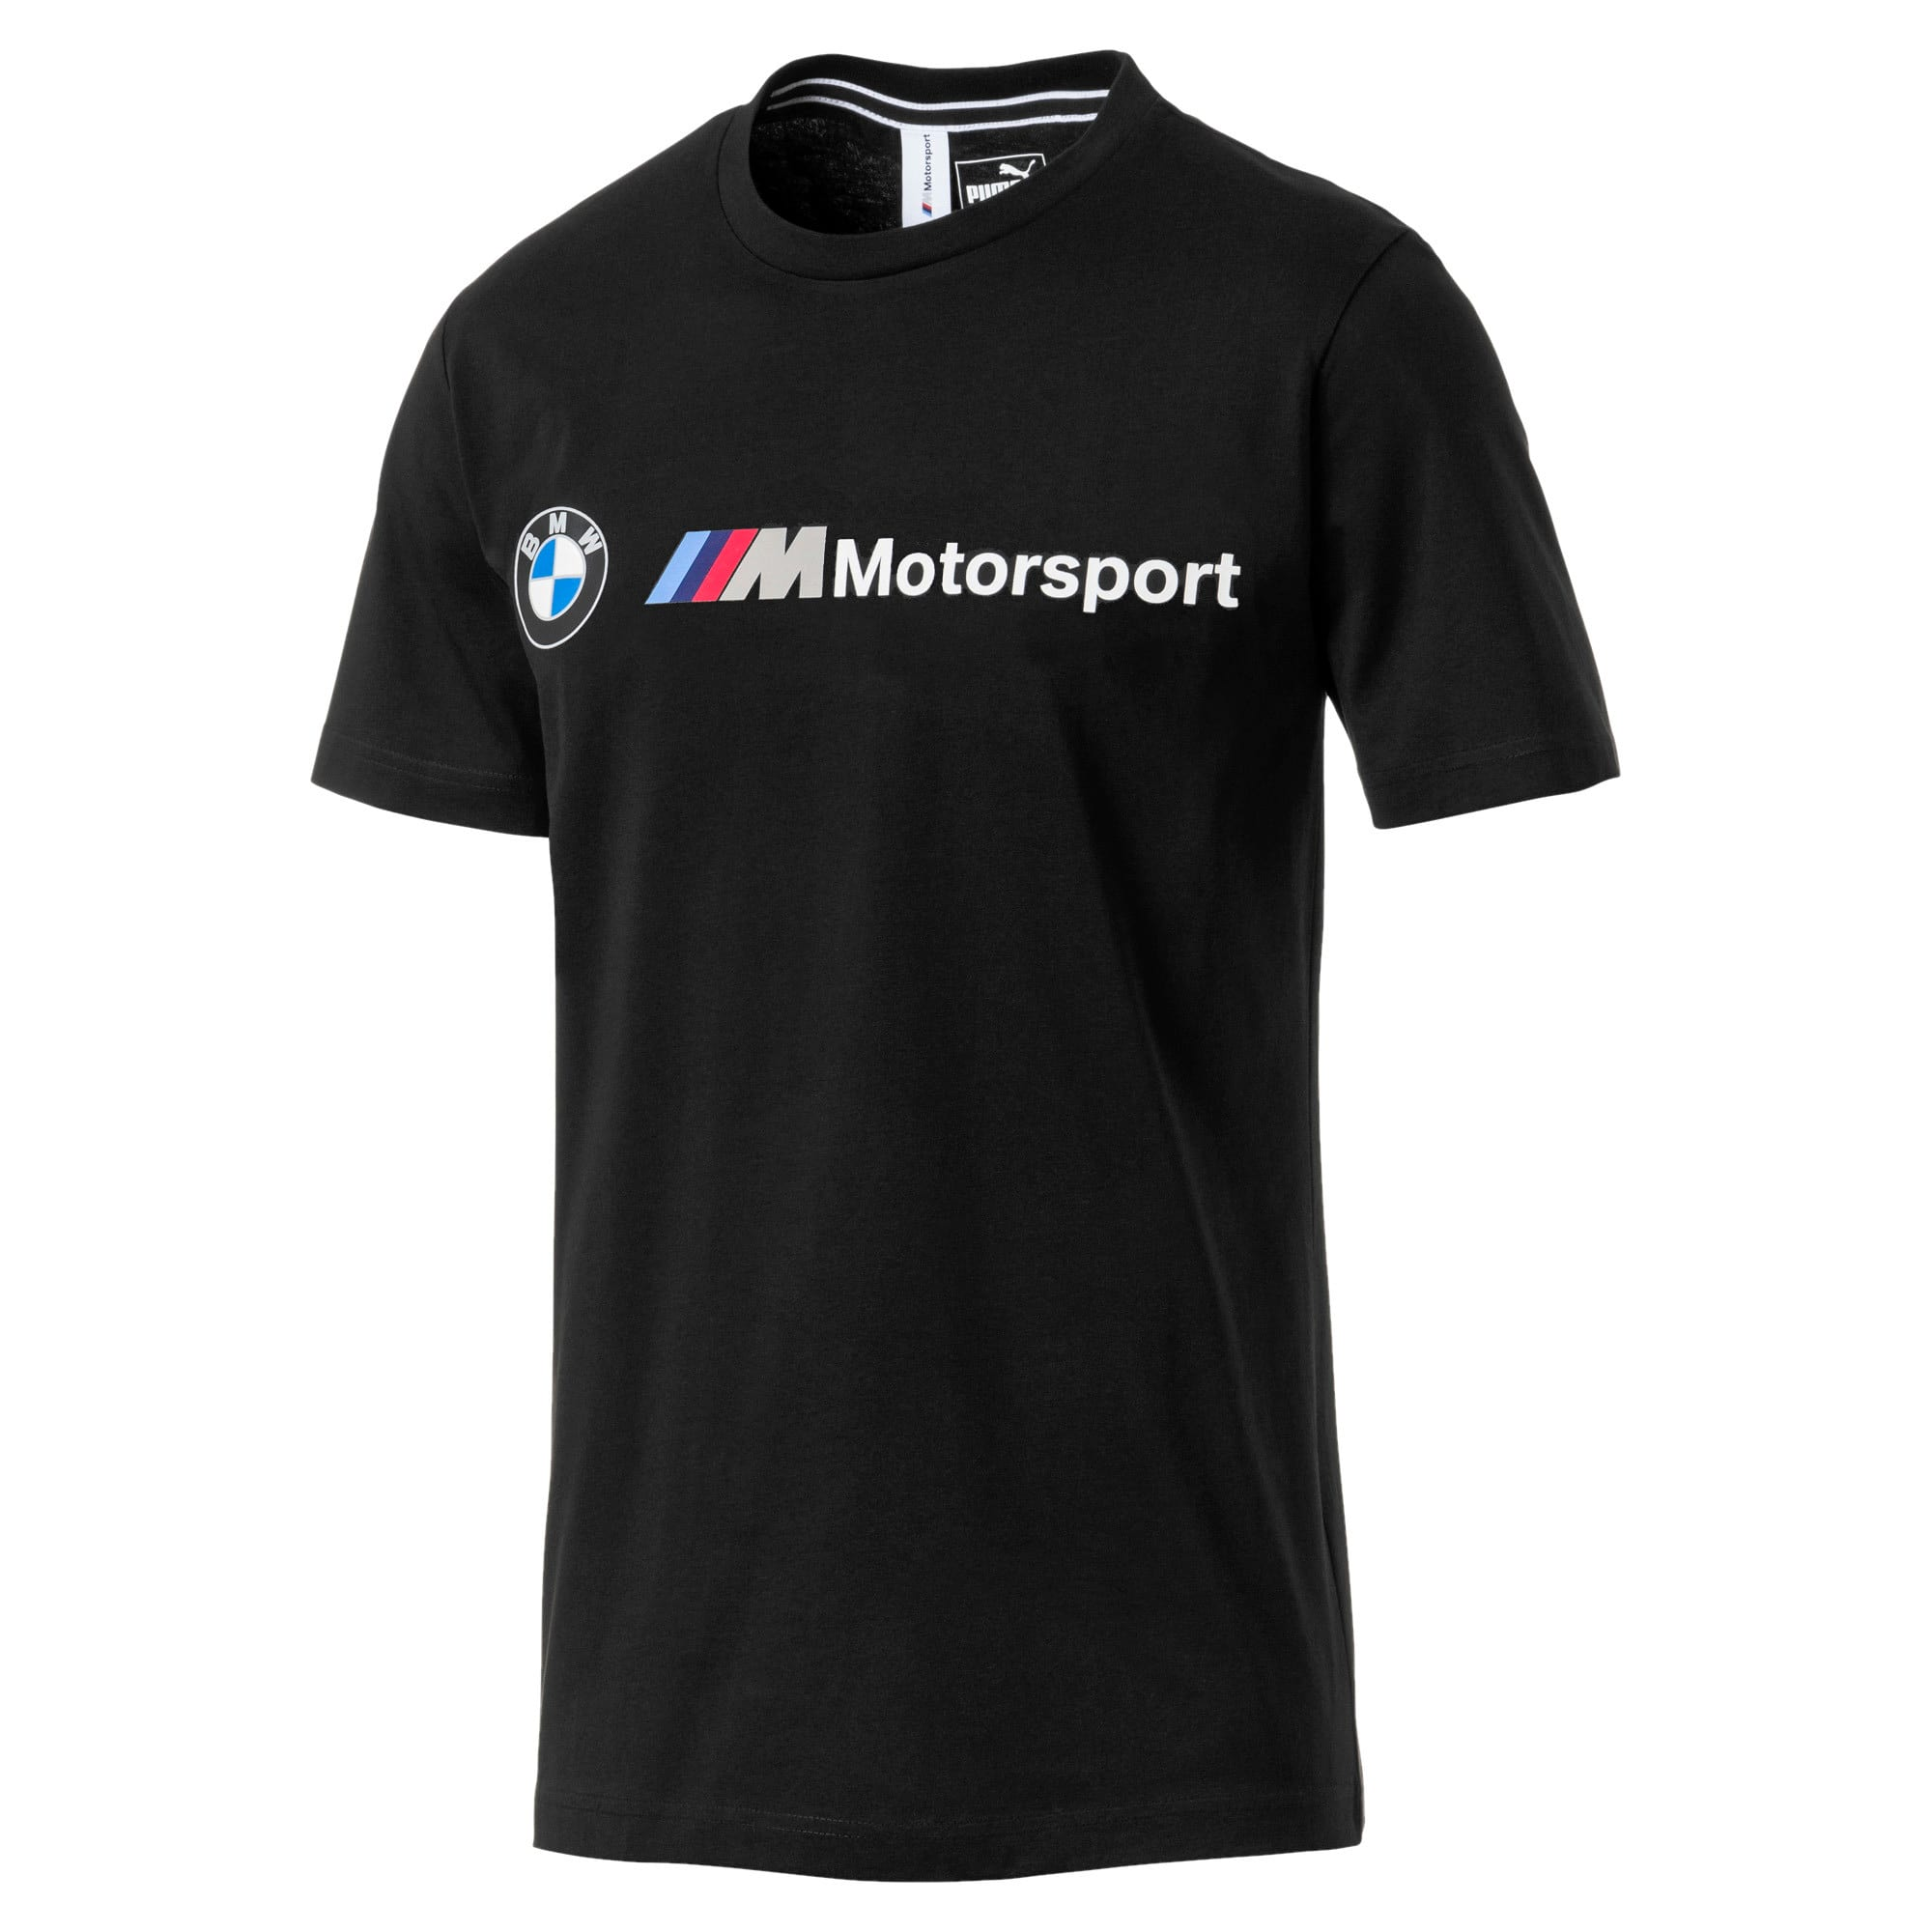 Thumbnail 4 of T-shirt con logo BMW M Motorsport uomo, Puma Black, medium